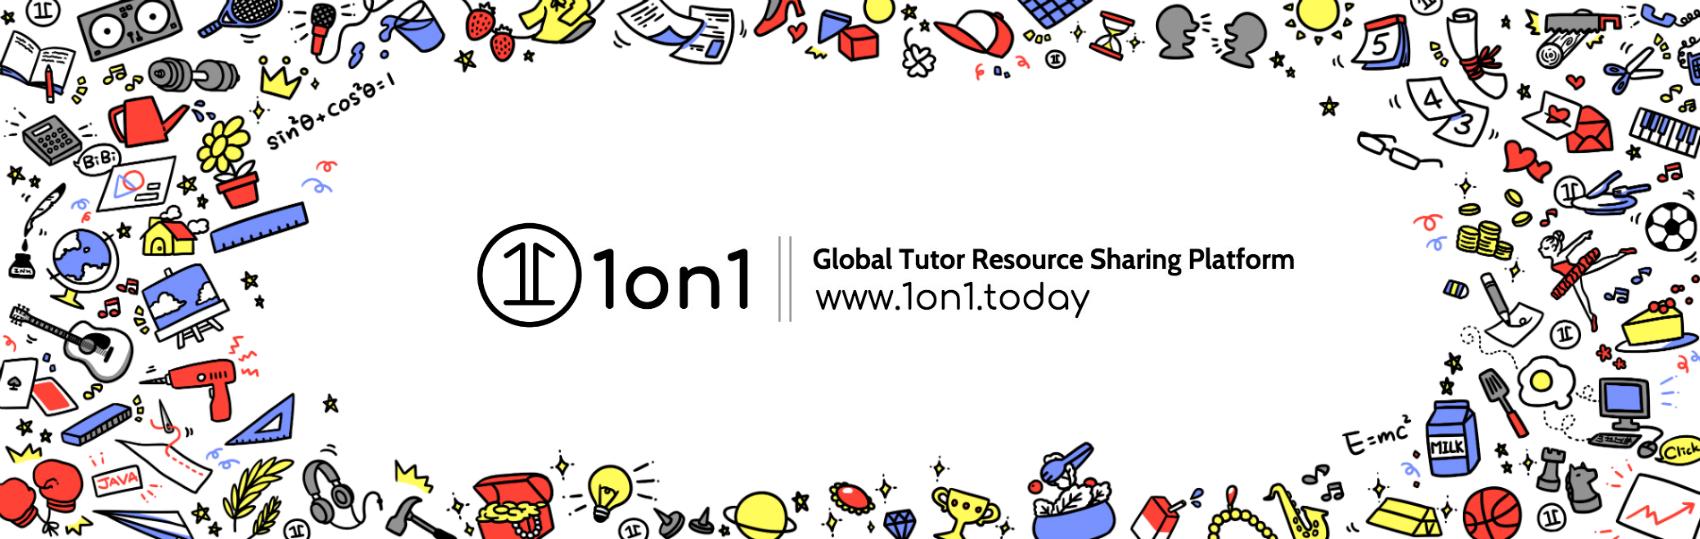 For Freelance Teachers / Tutors / Coaches / Experts